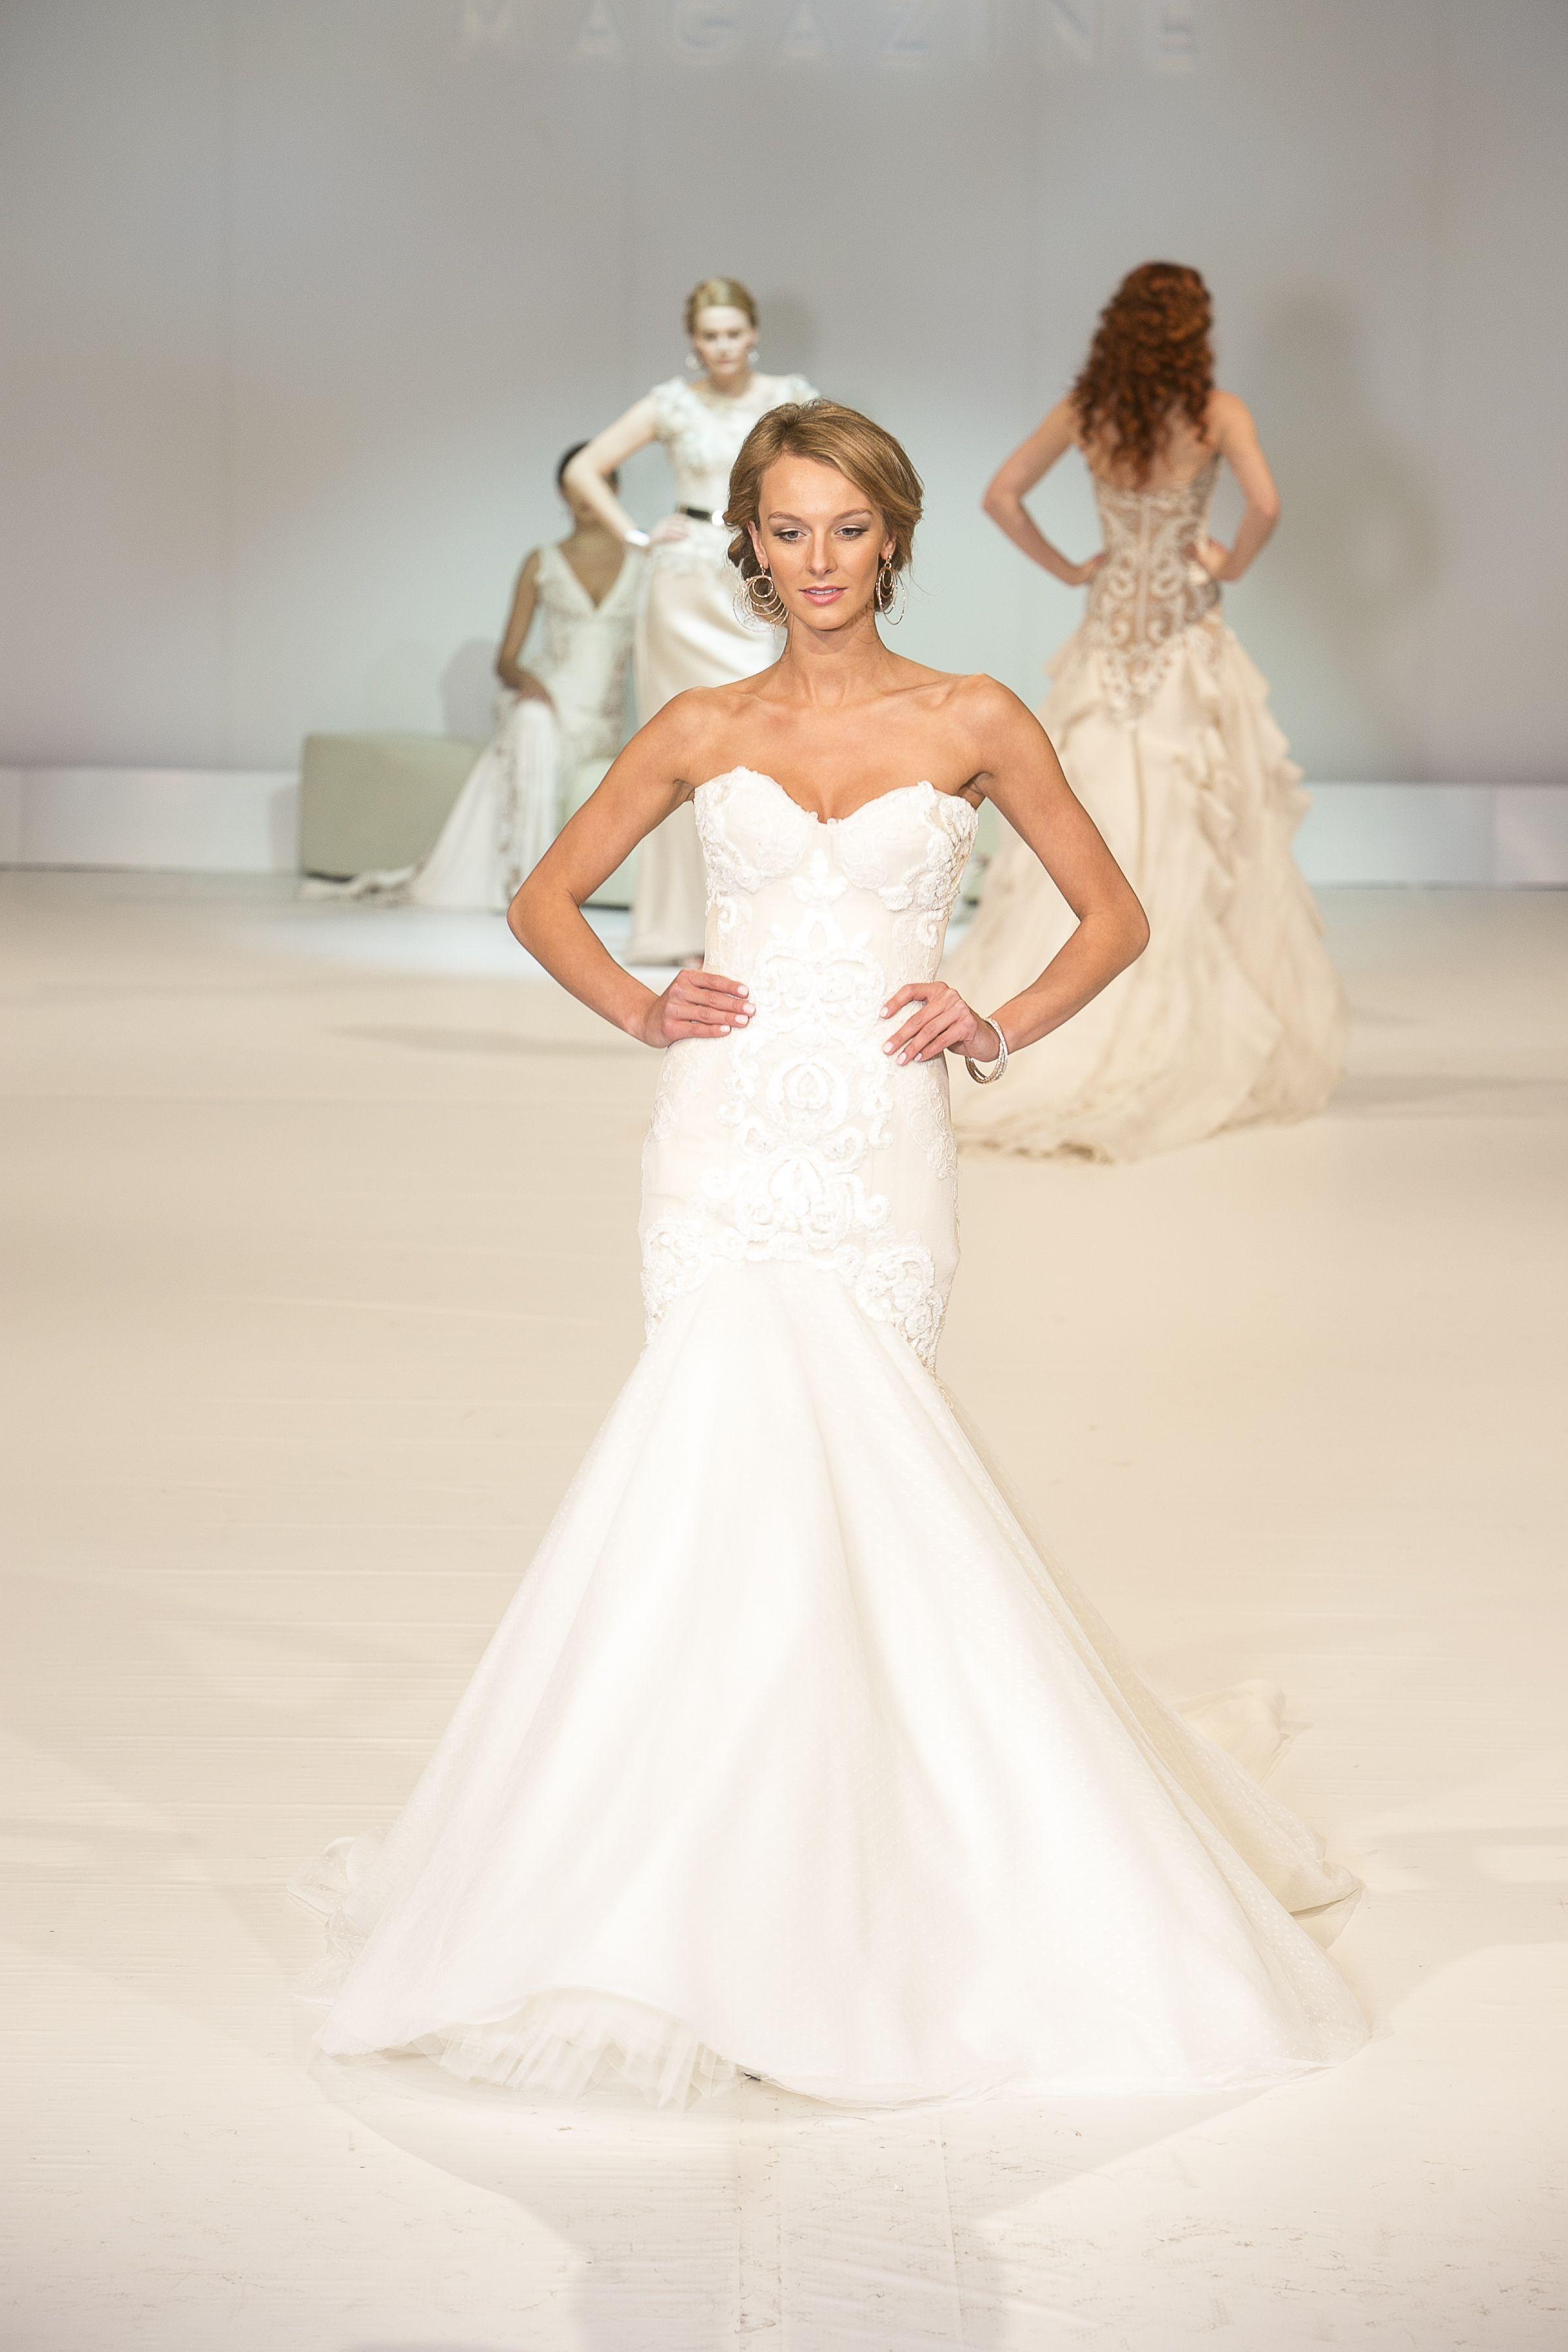 Mermaid shape from craig braybrook wedding dresses for Mermaid shape wedding dress